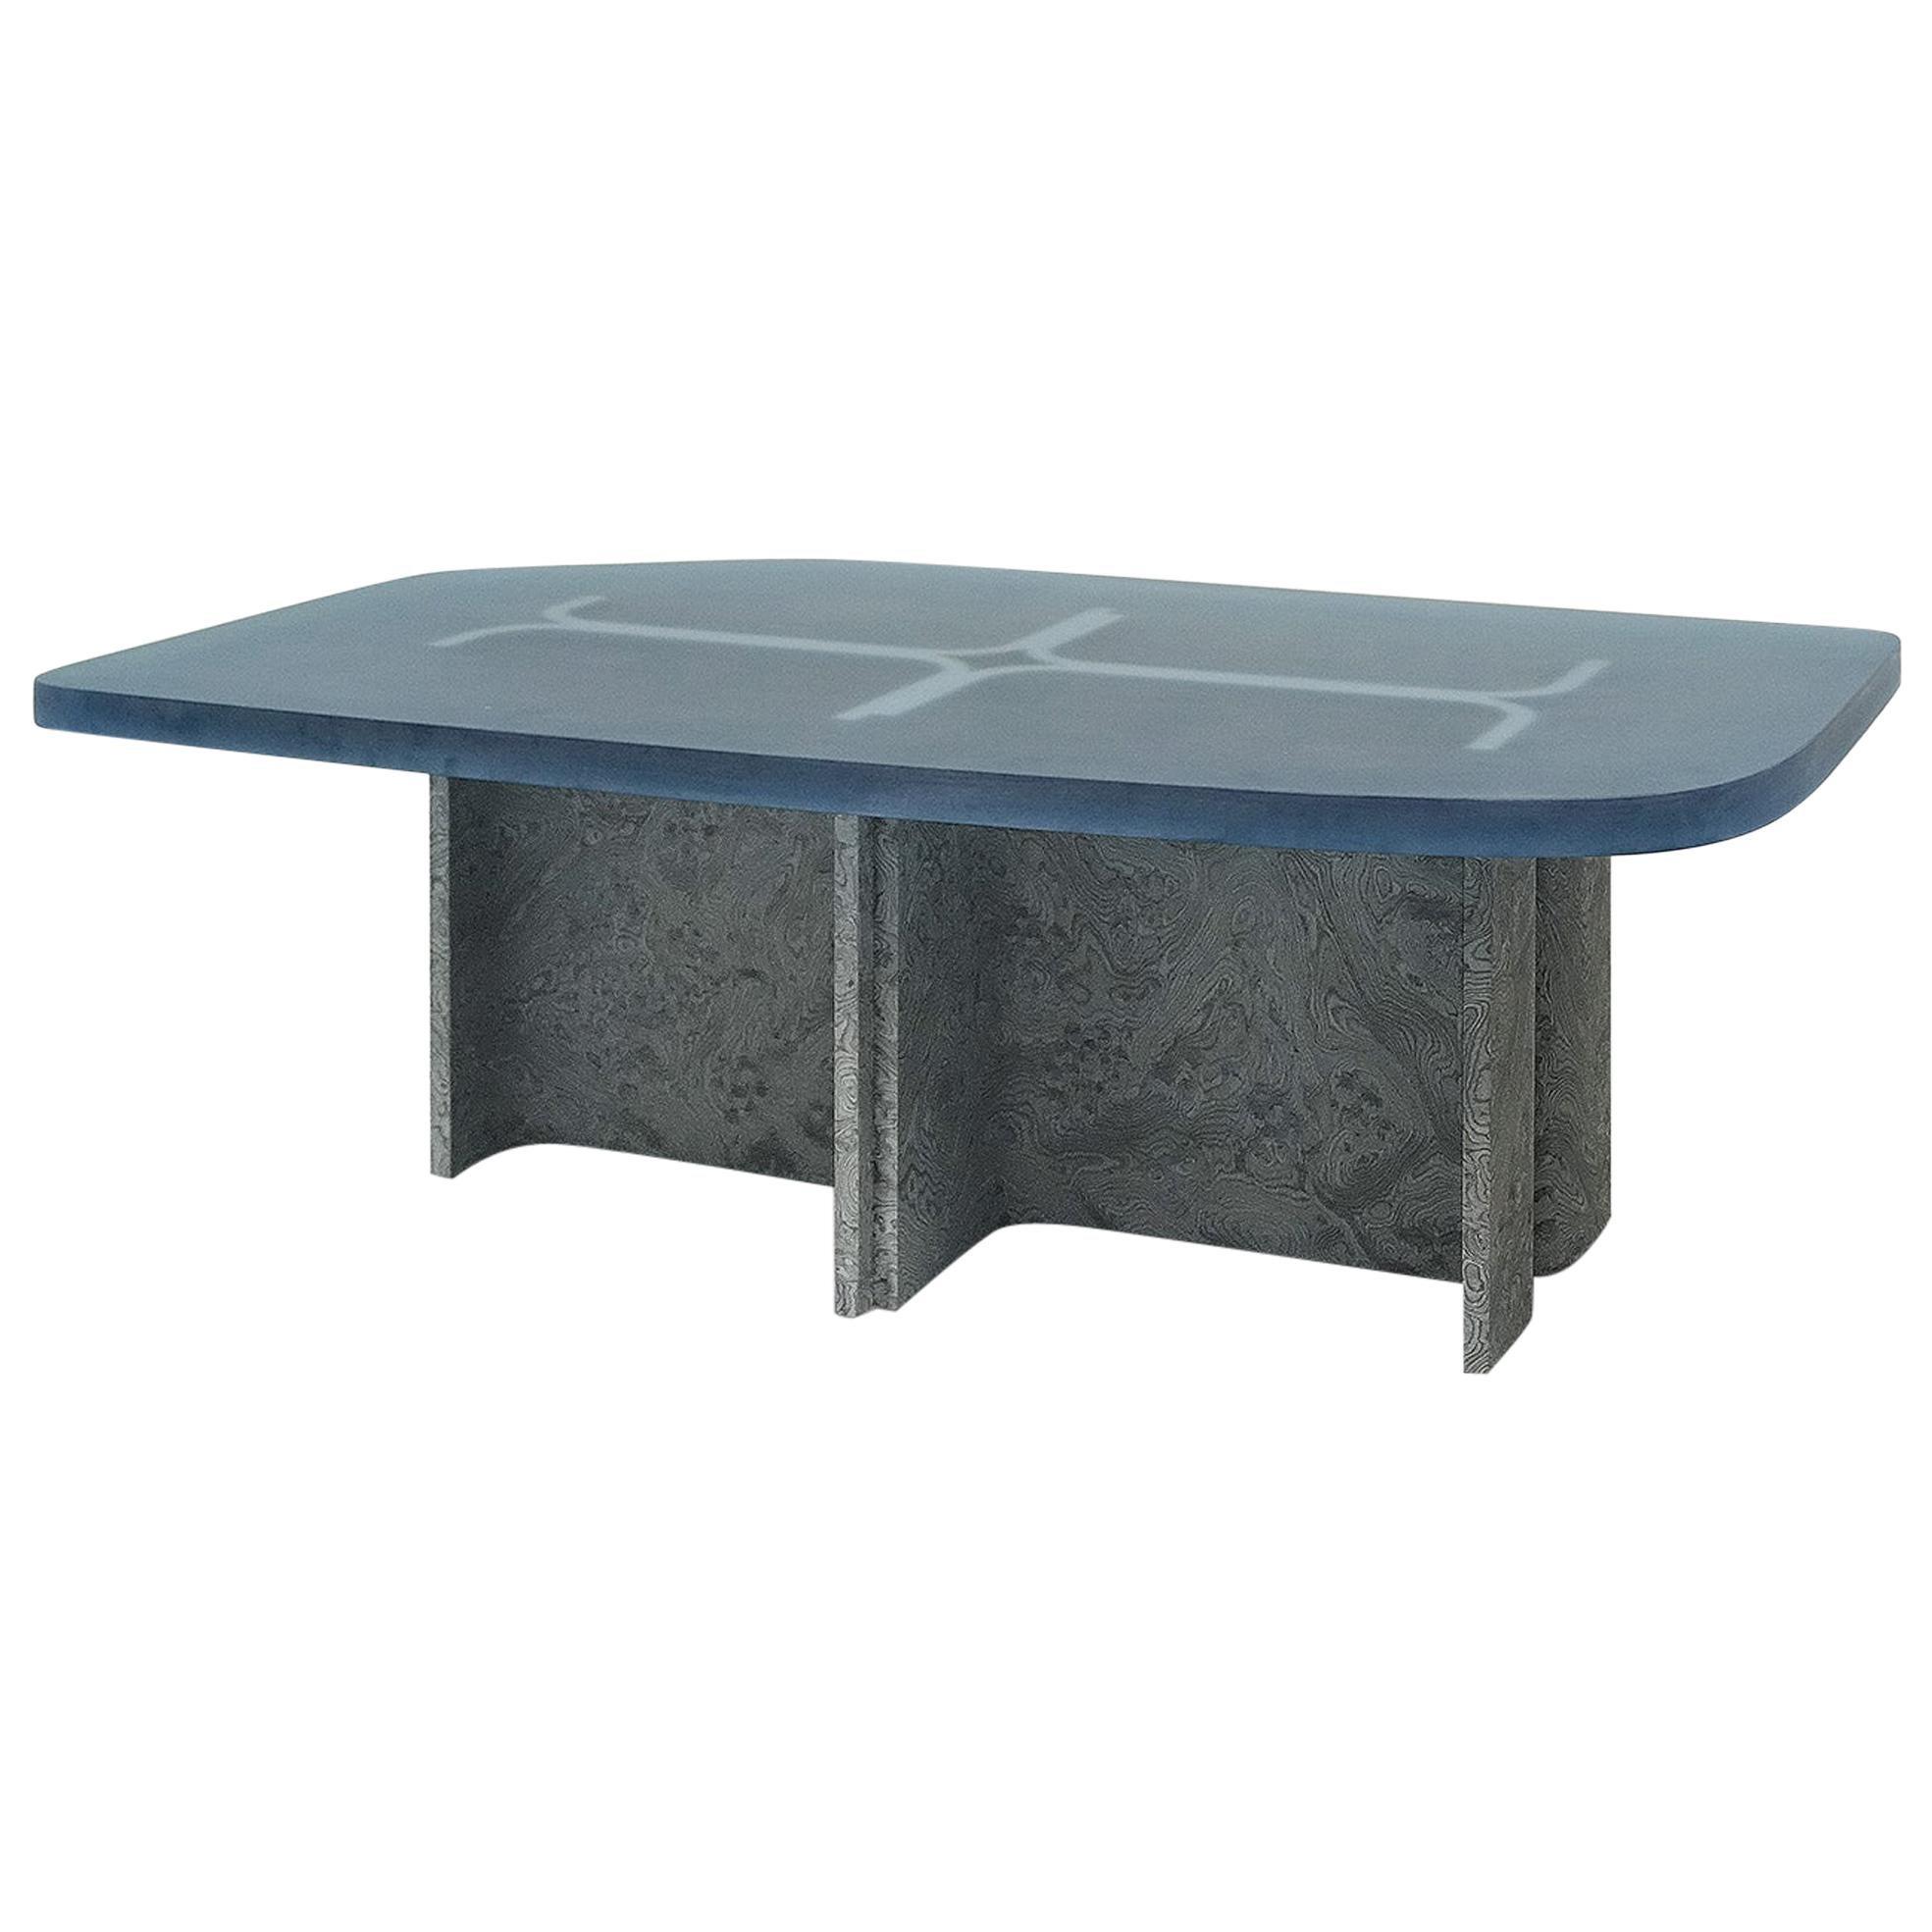 'Fossil' Coffee Table in Grey Elm Burl Veneer and Aqua Blue Opaque Resin